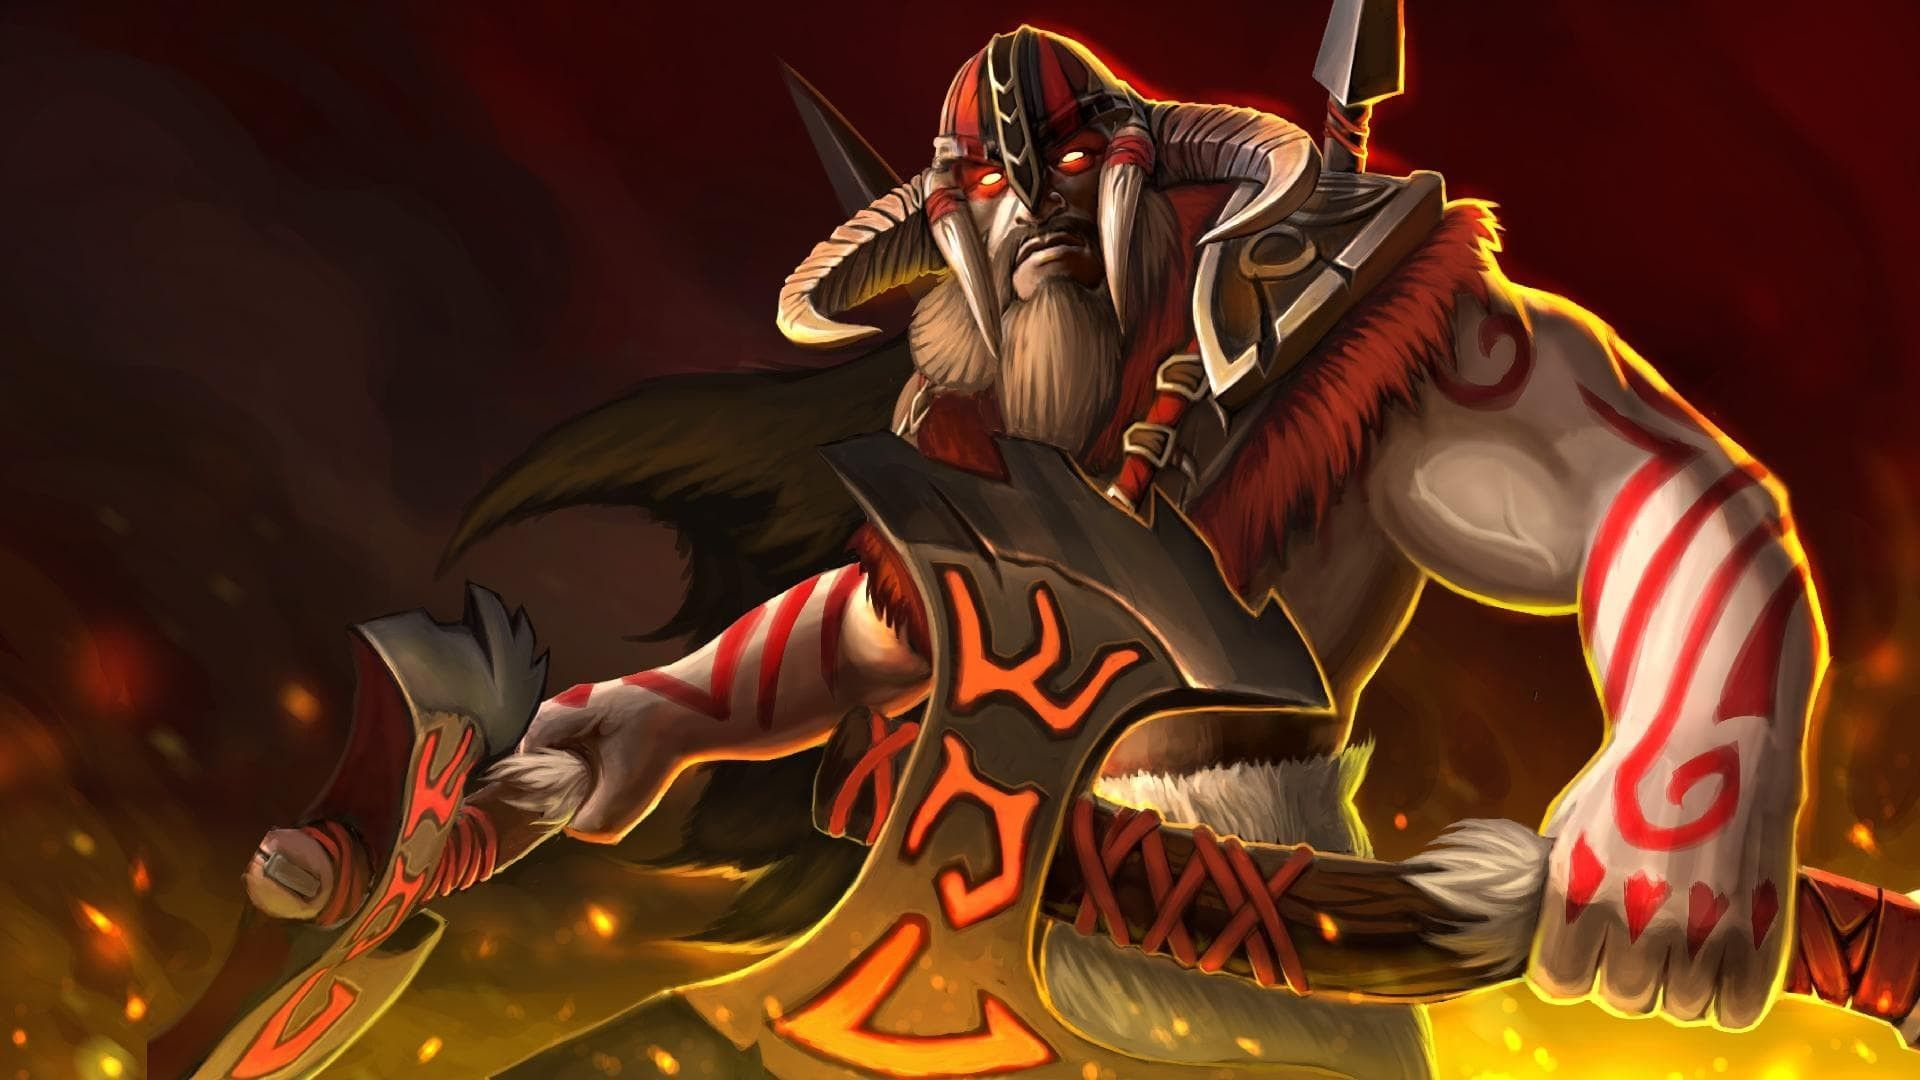 Beastmaster Dota 2 Wallpapers Top Free Beastmaster Dota 2